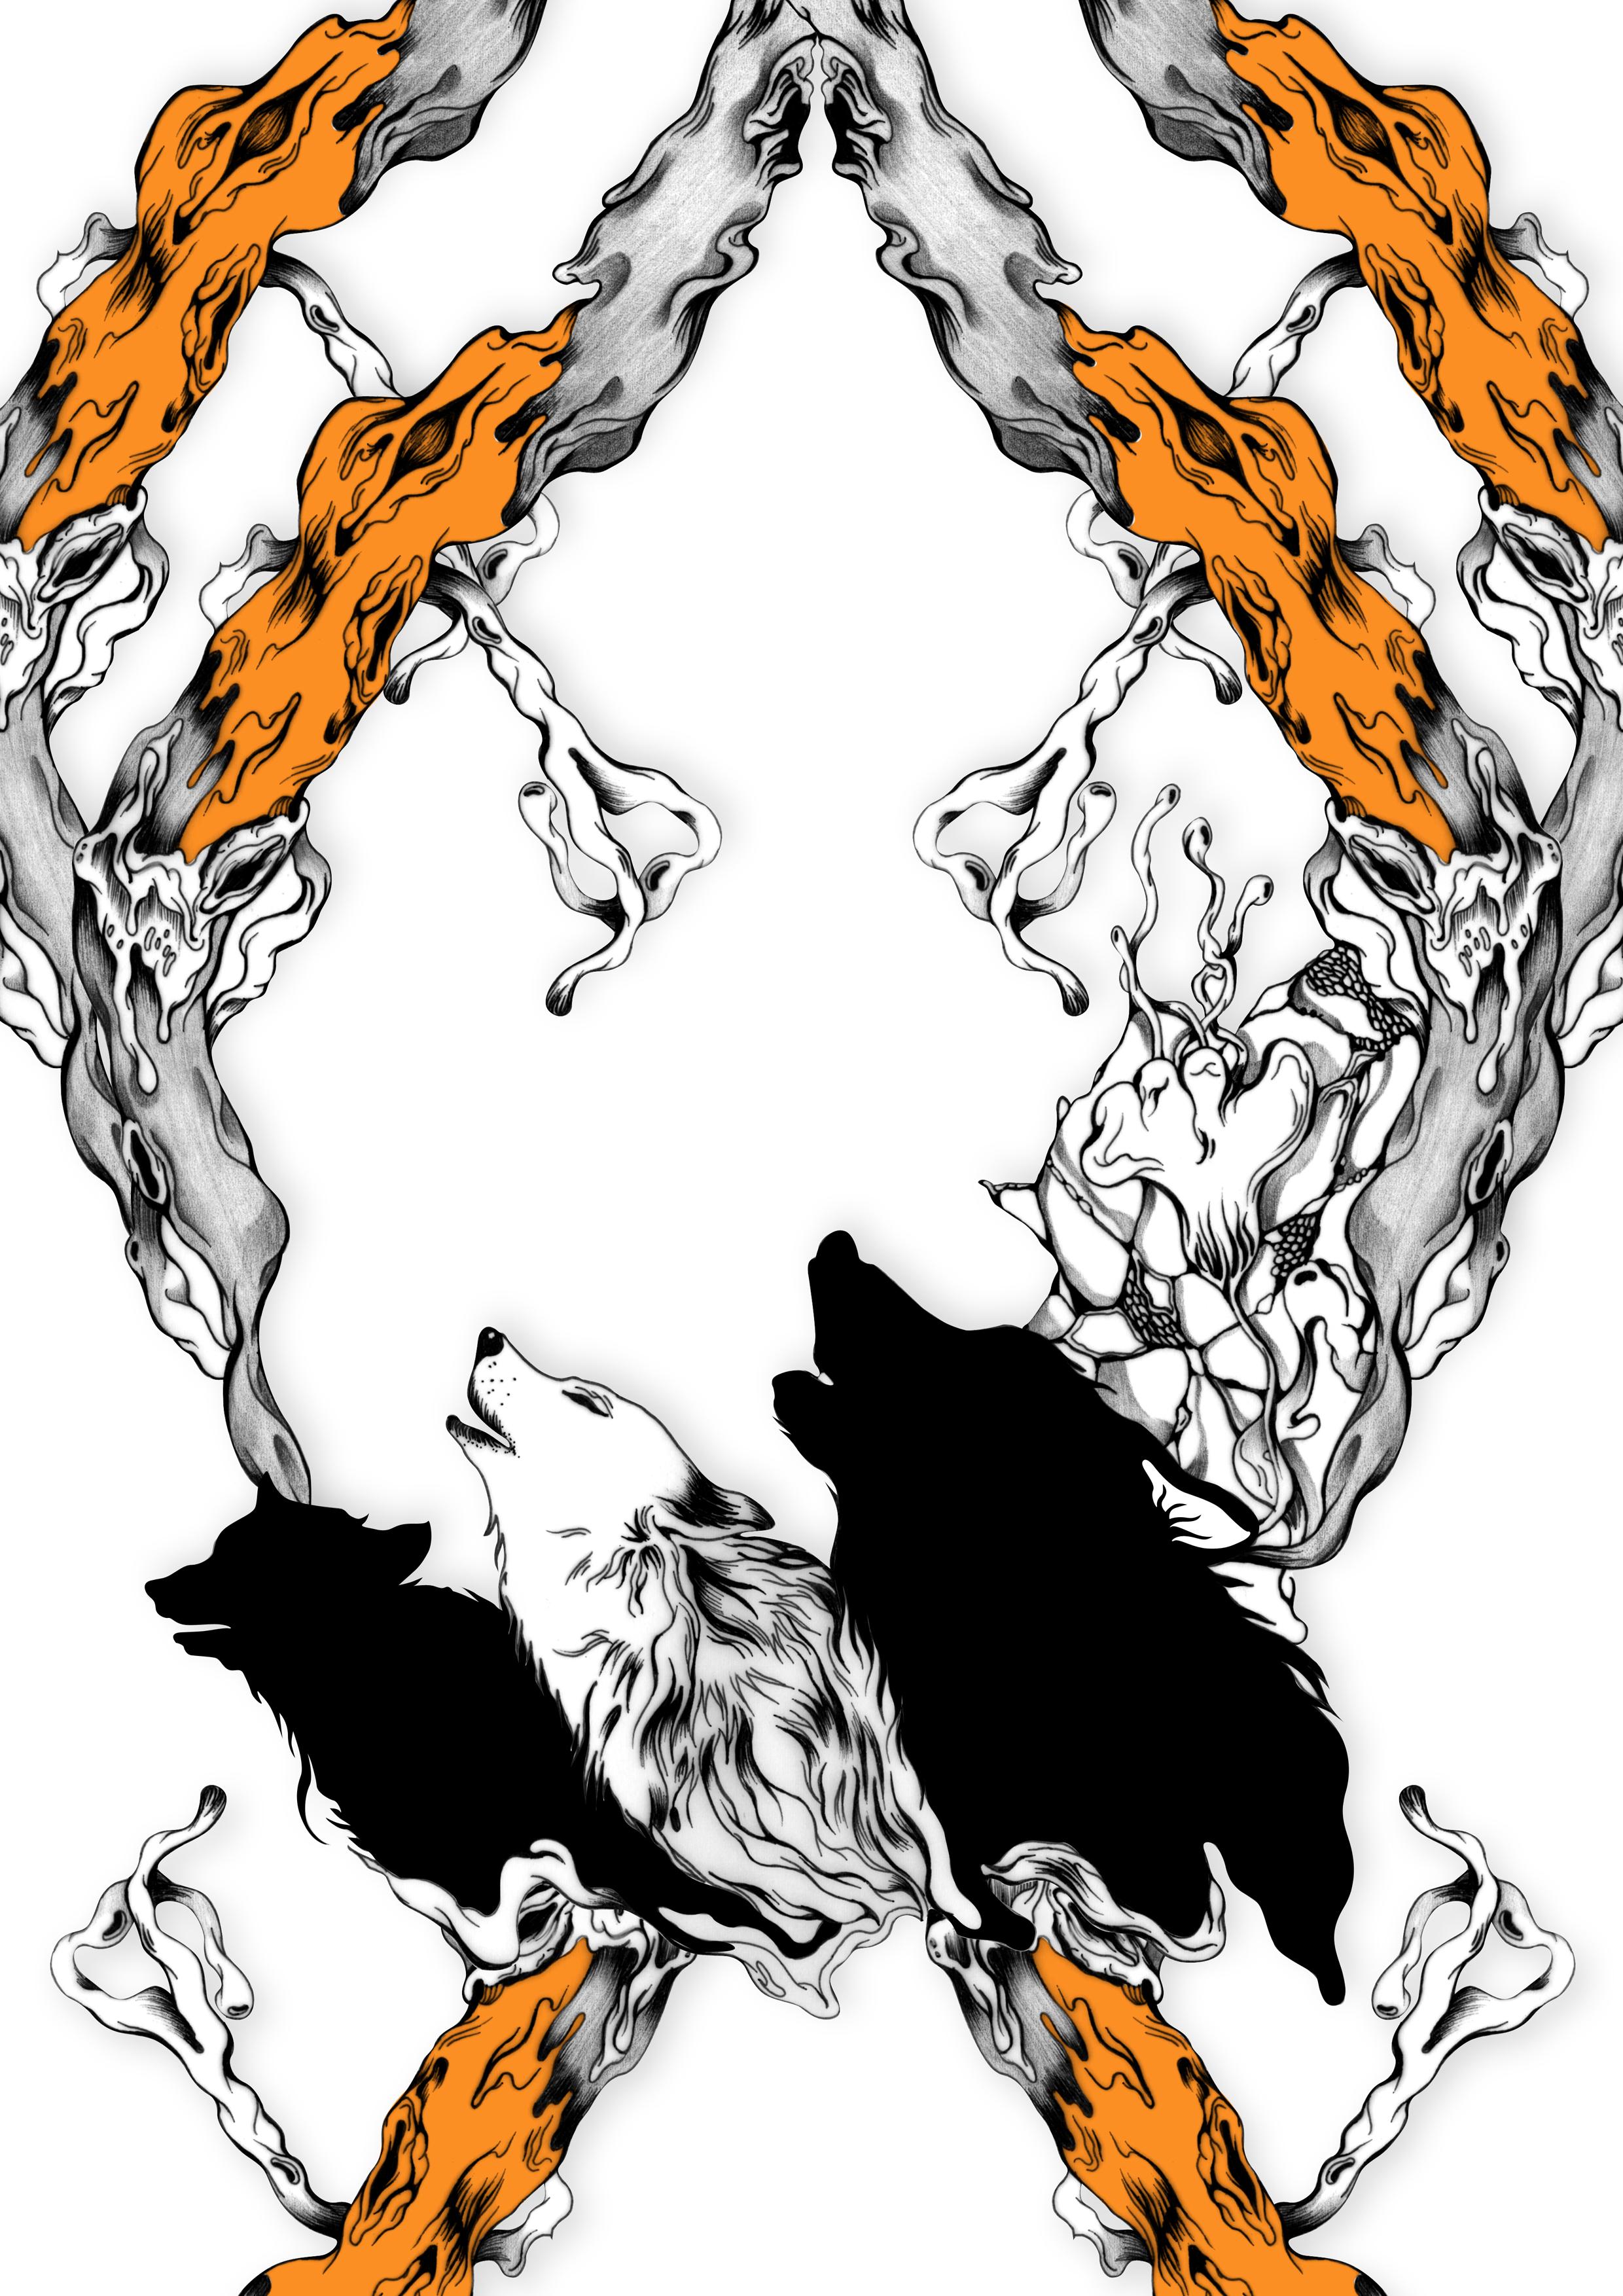 The Wolf_Frame2.jpg